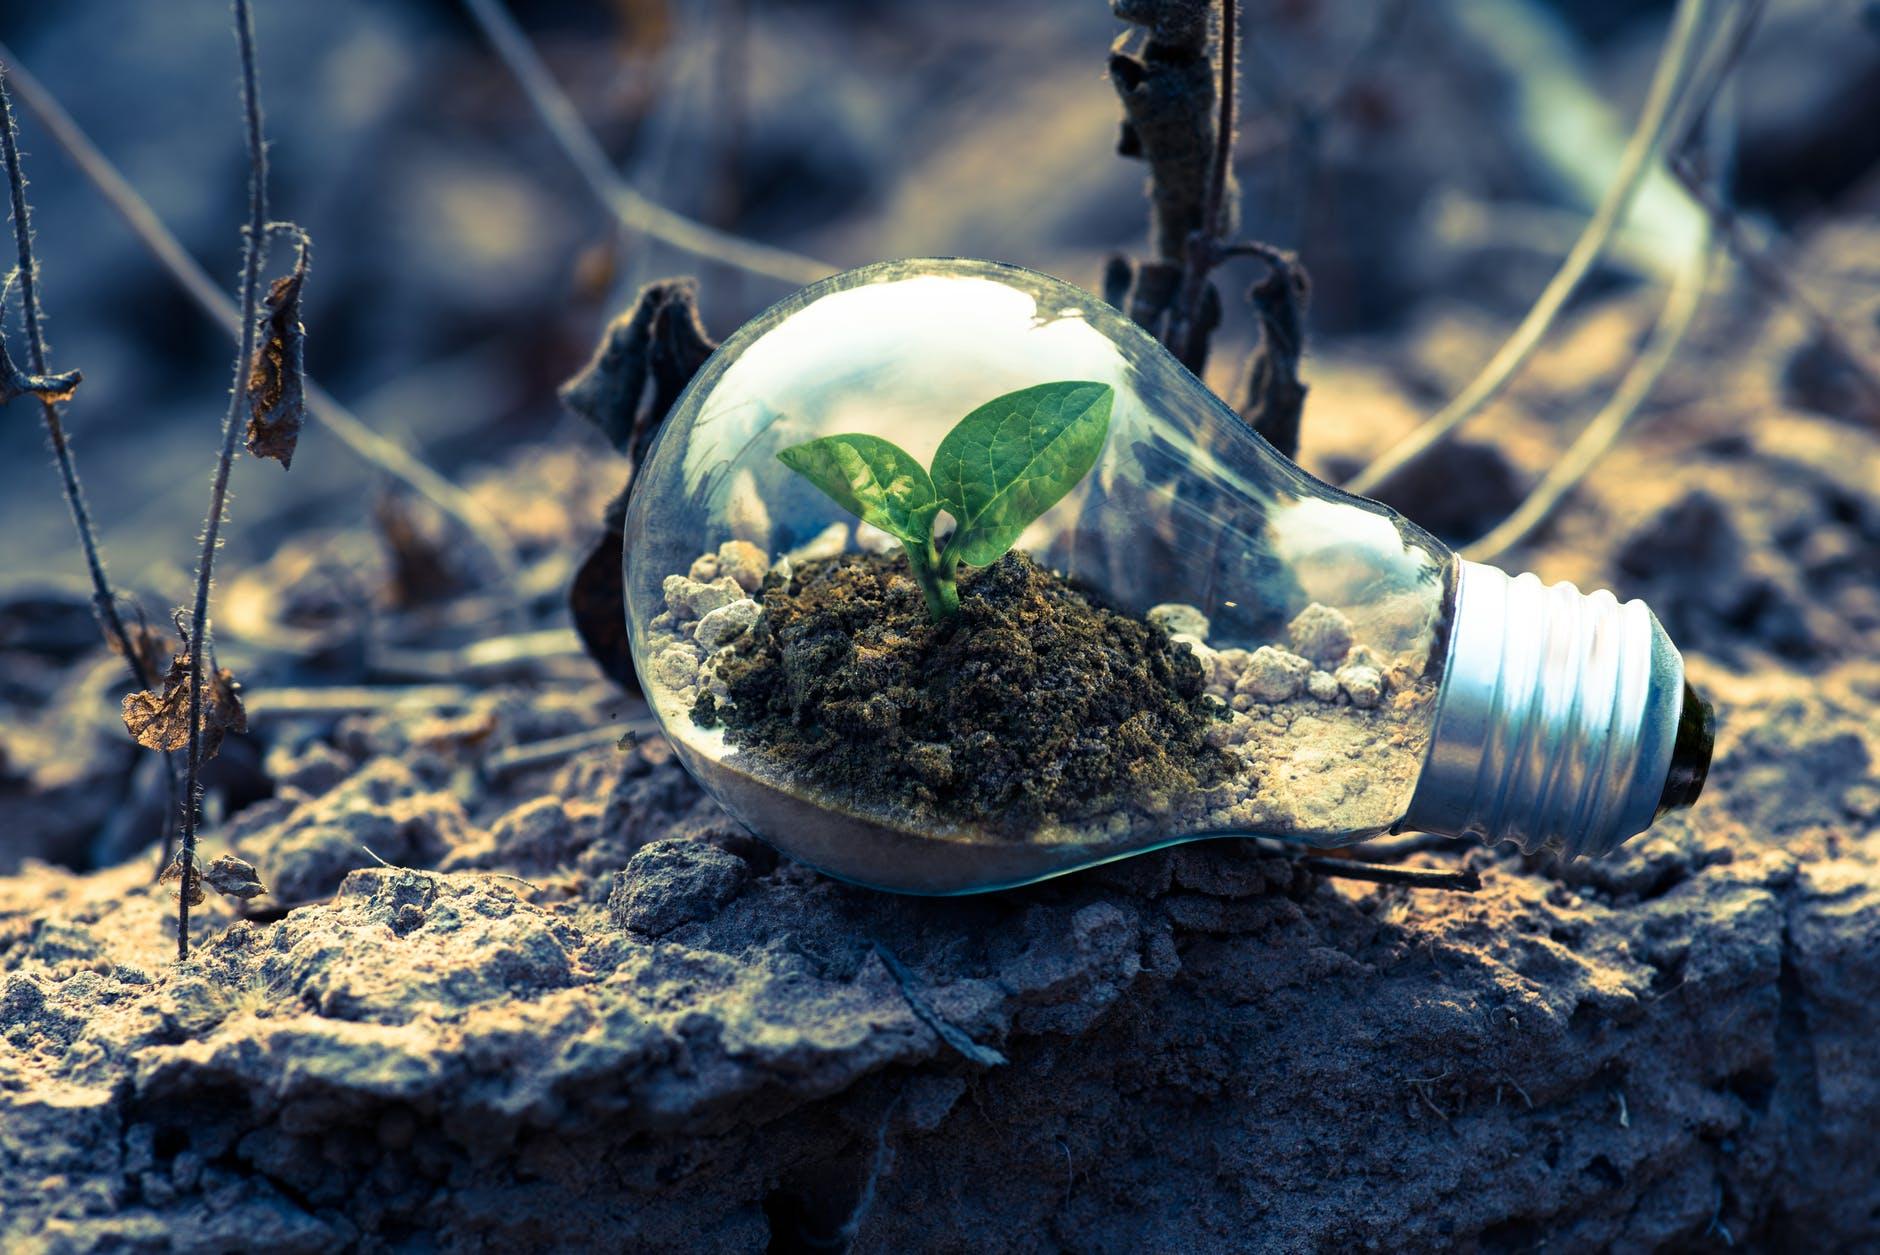 LINEとLINE Ventures投資分析:LINEが目指す世界とは-green